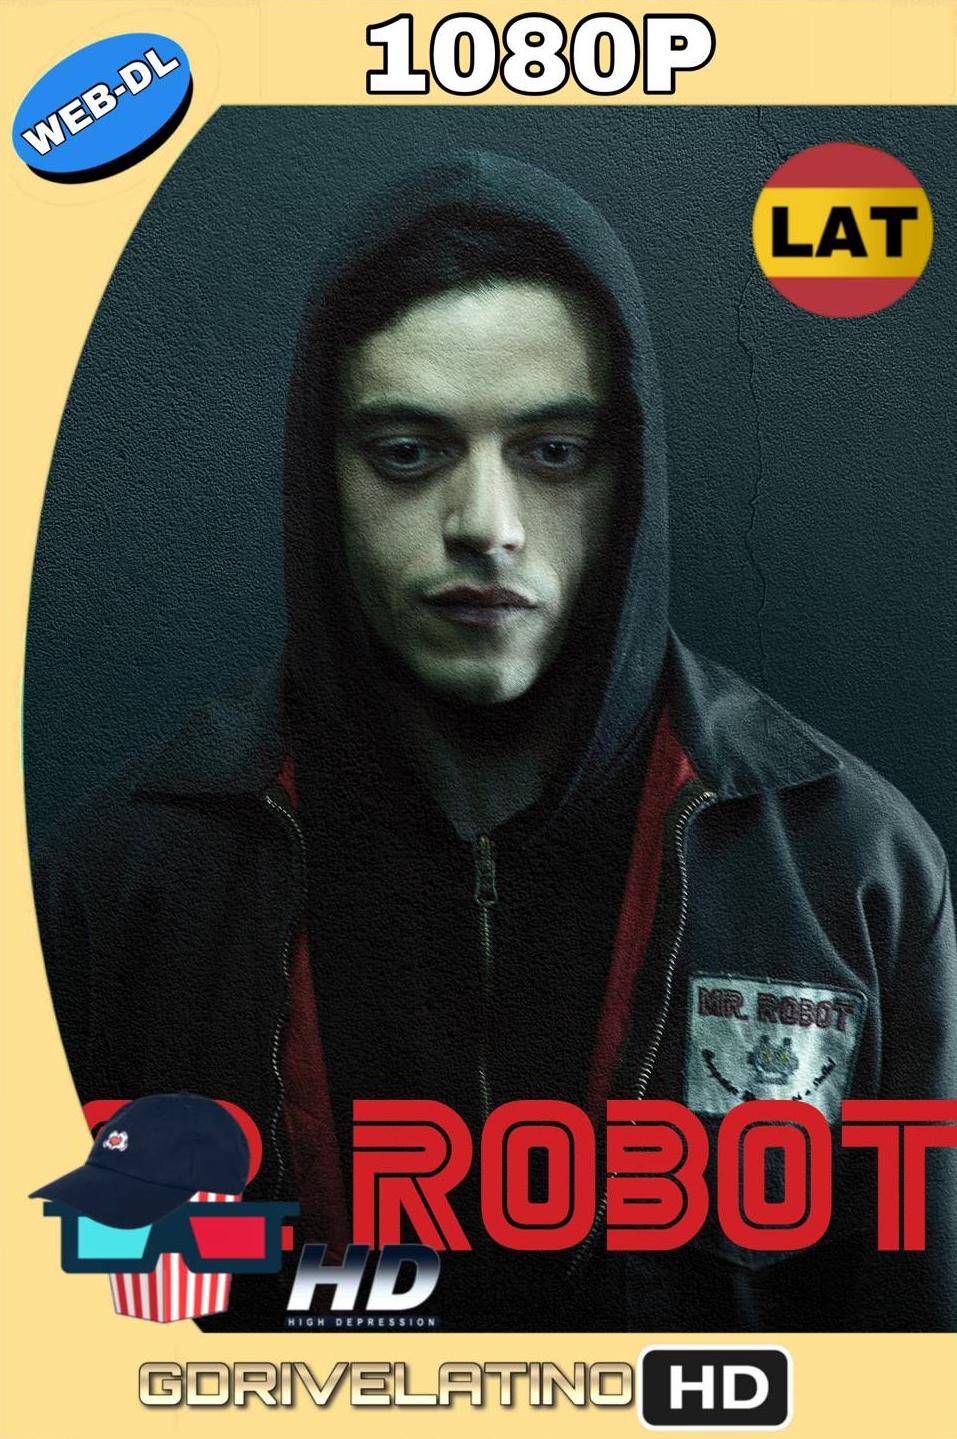 Mr. Robot (2015) Temporada 1 Web DL 1080P Latino-Ingles MKV